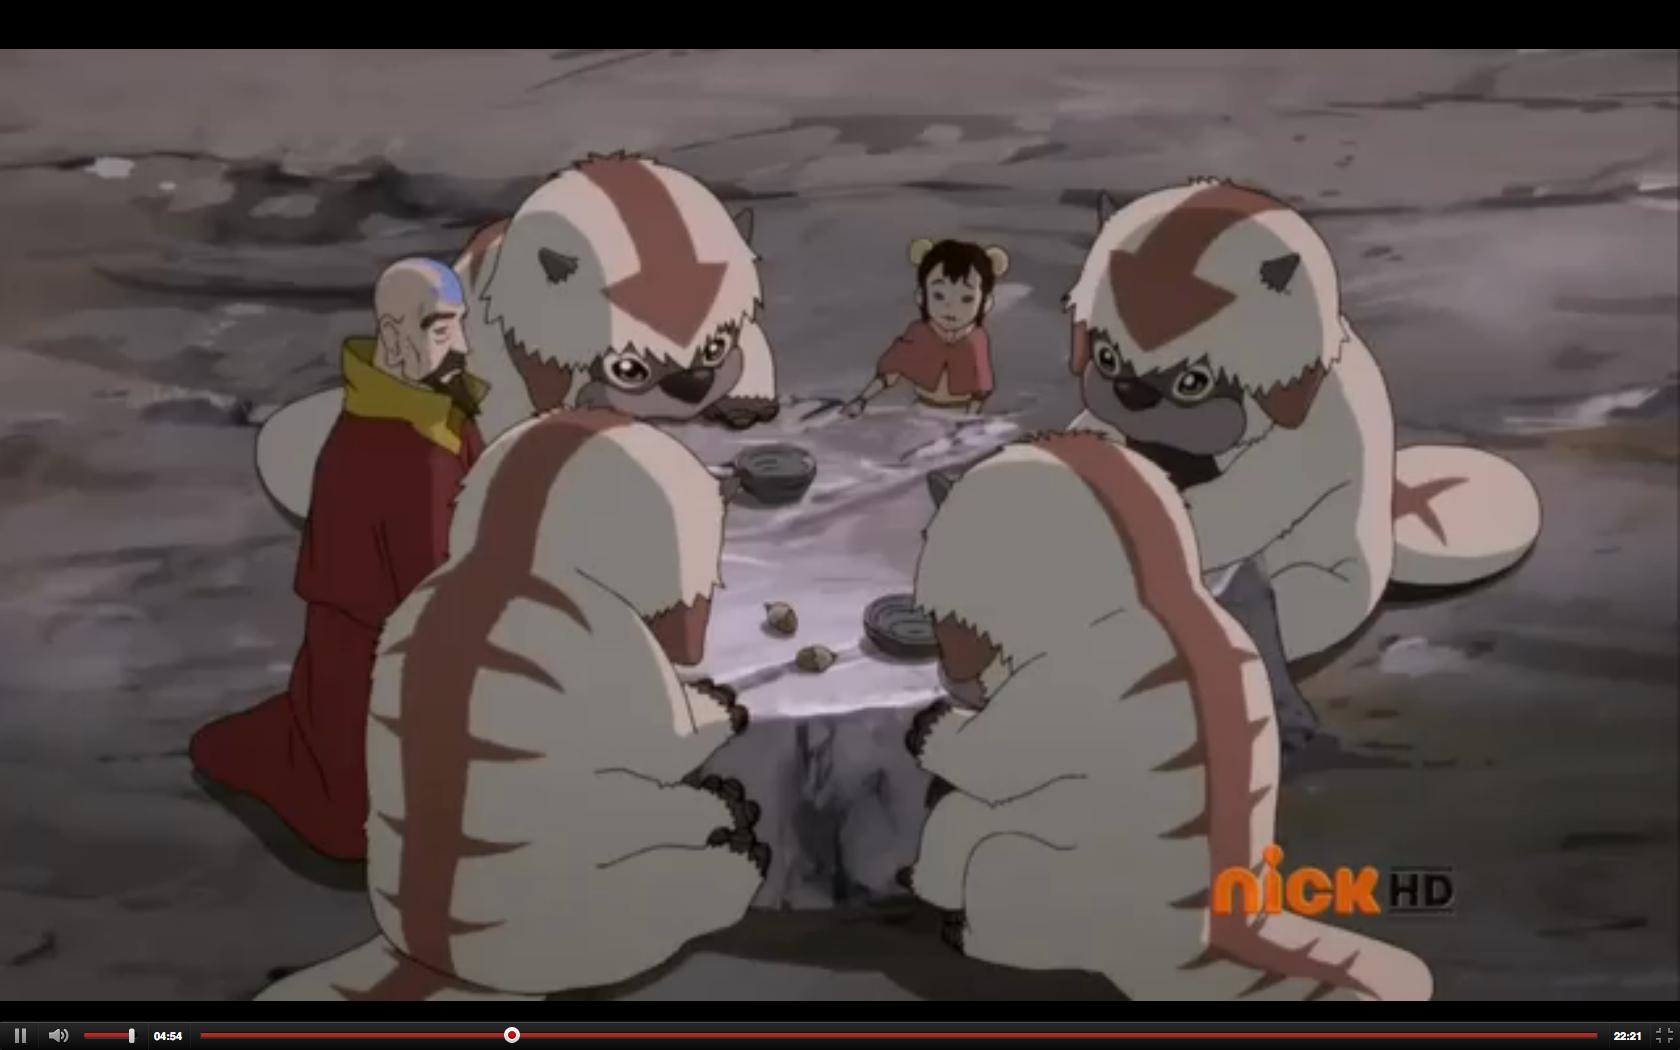 baby flying bison from legend of korra Avatar, Avatar